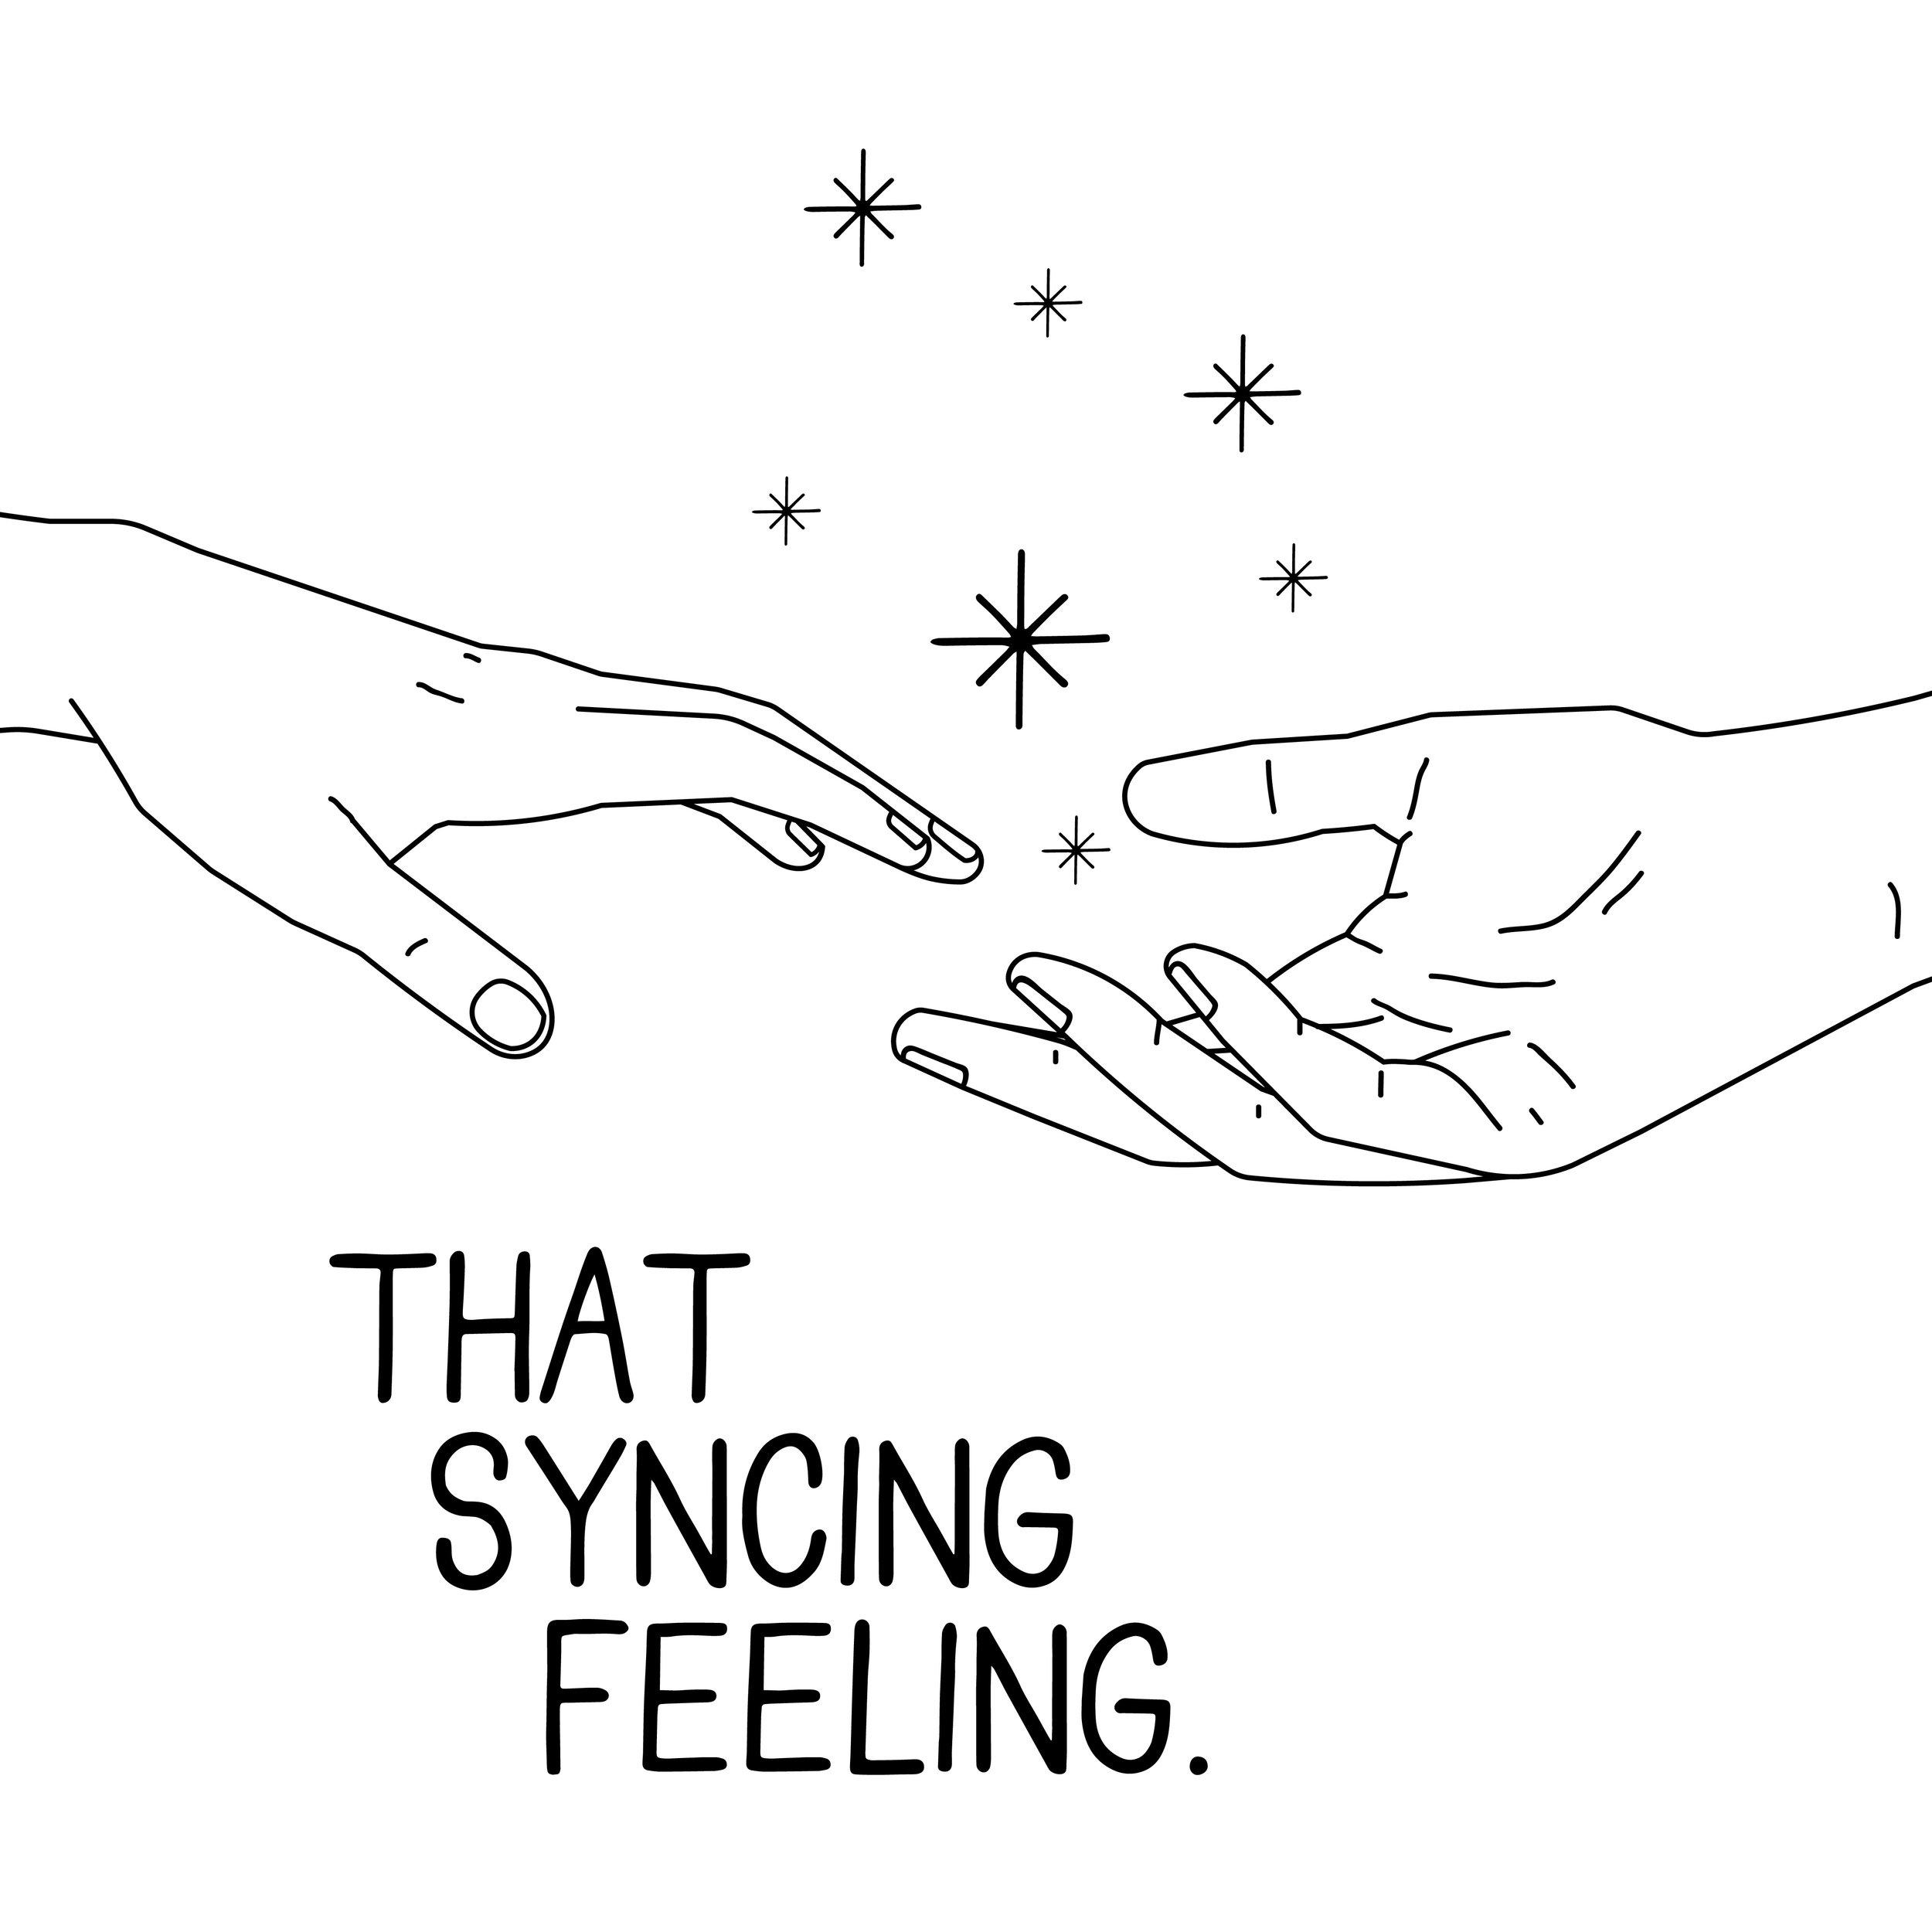 syncingfeeling-01.jpg